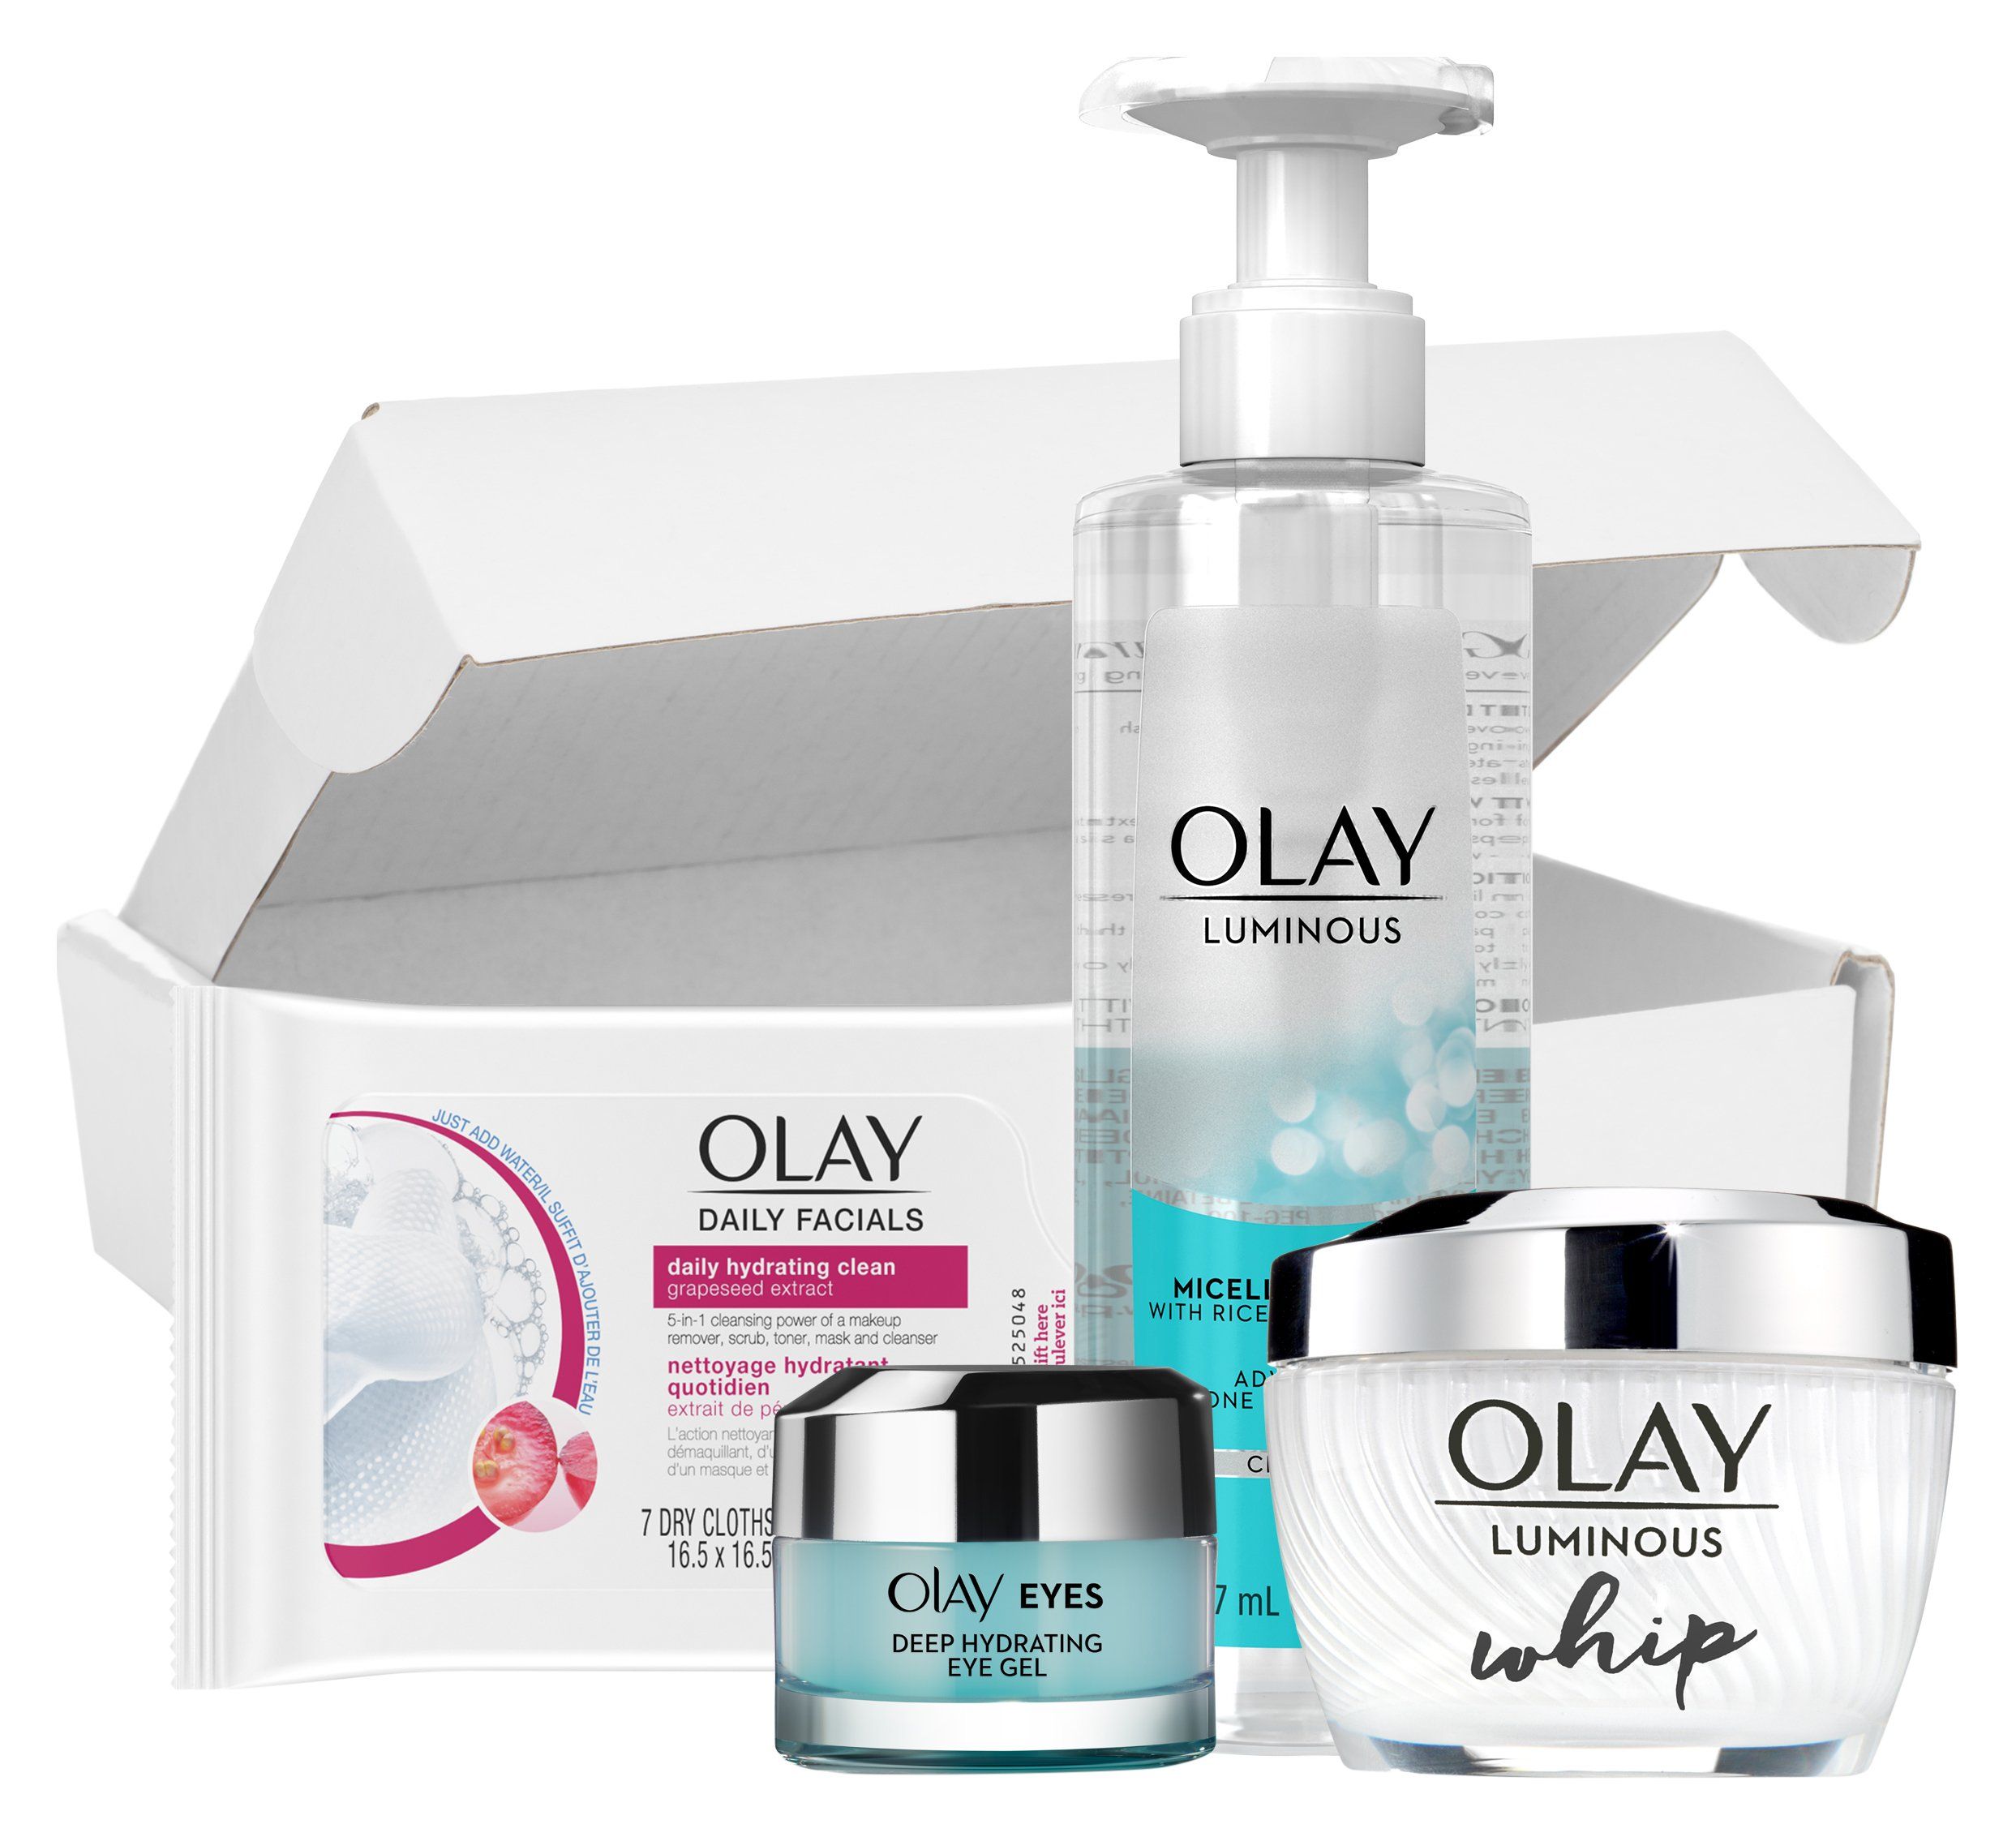 SkinCare Kit by Olay Luminous Daily Glow Regimen Kit, Cleanser + Whip Moisturizer + Eye Gel + Bonus Wipes by Olay